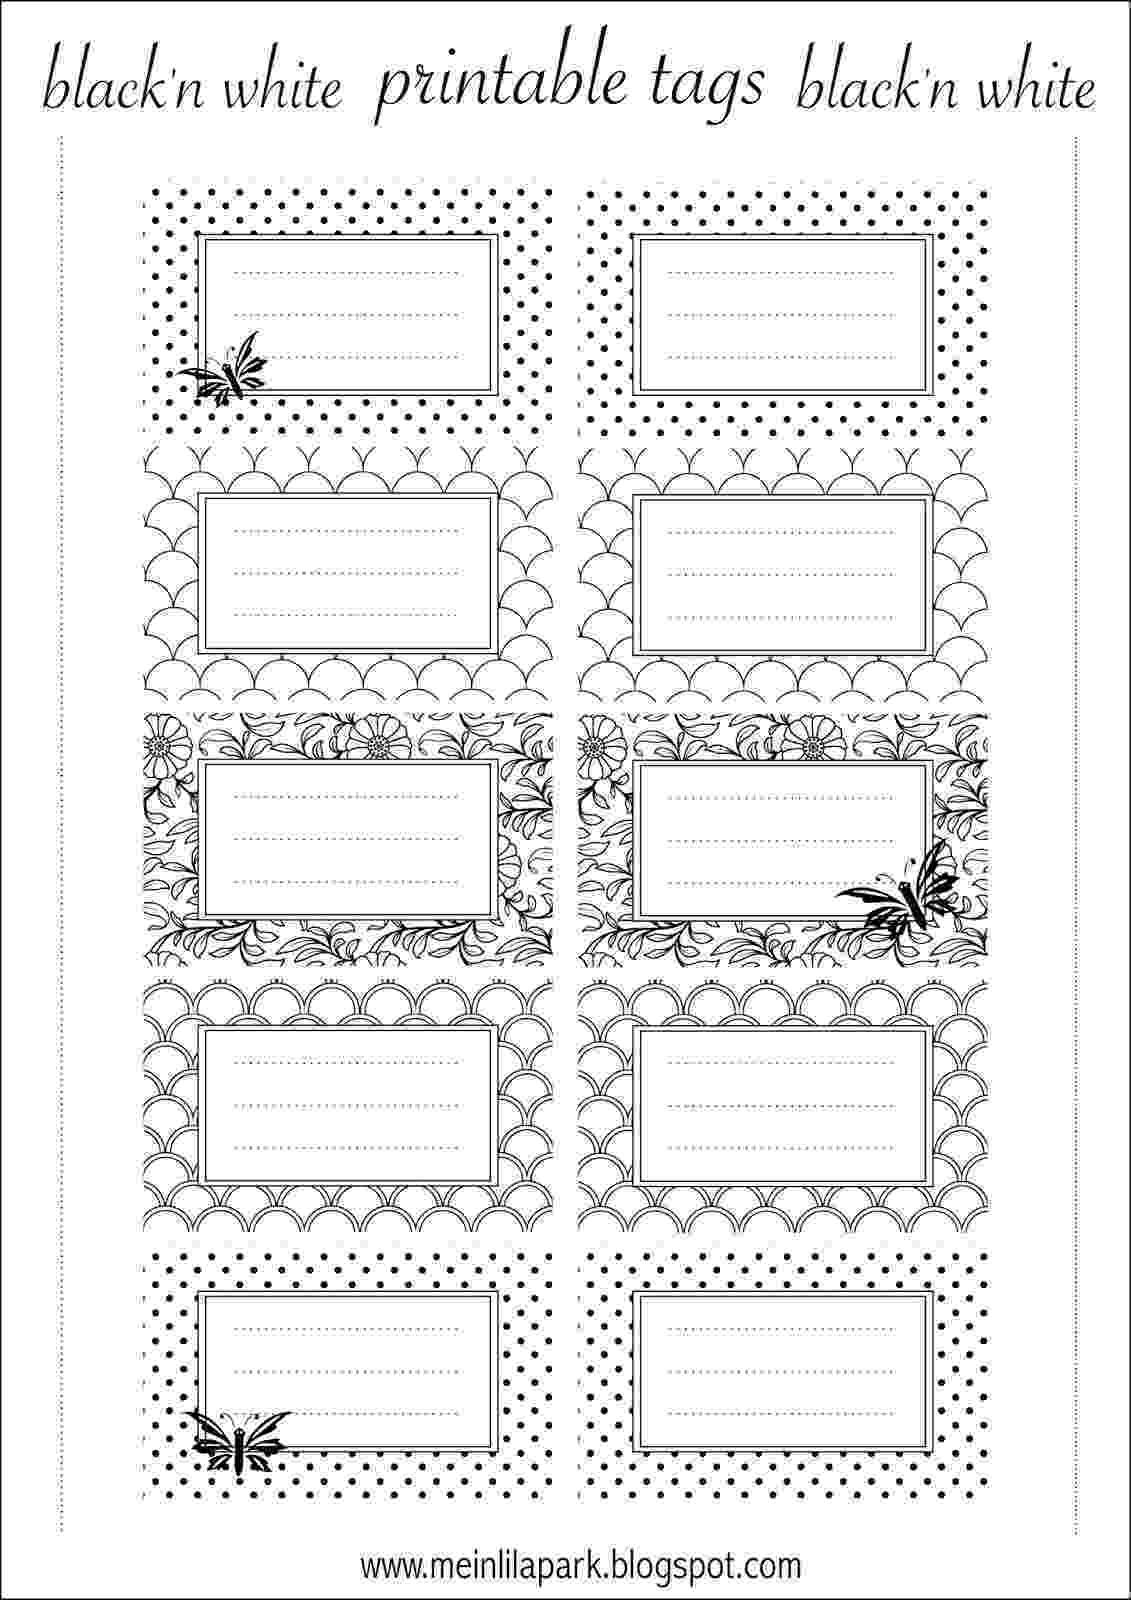 printable coloring nameplates free printable tags black and white ausdruckbare printable coloring nameplates